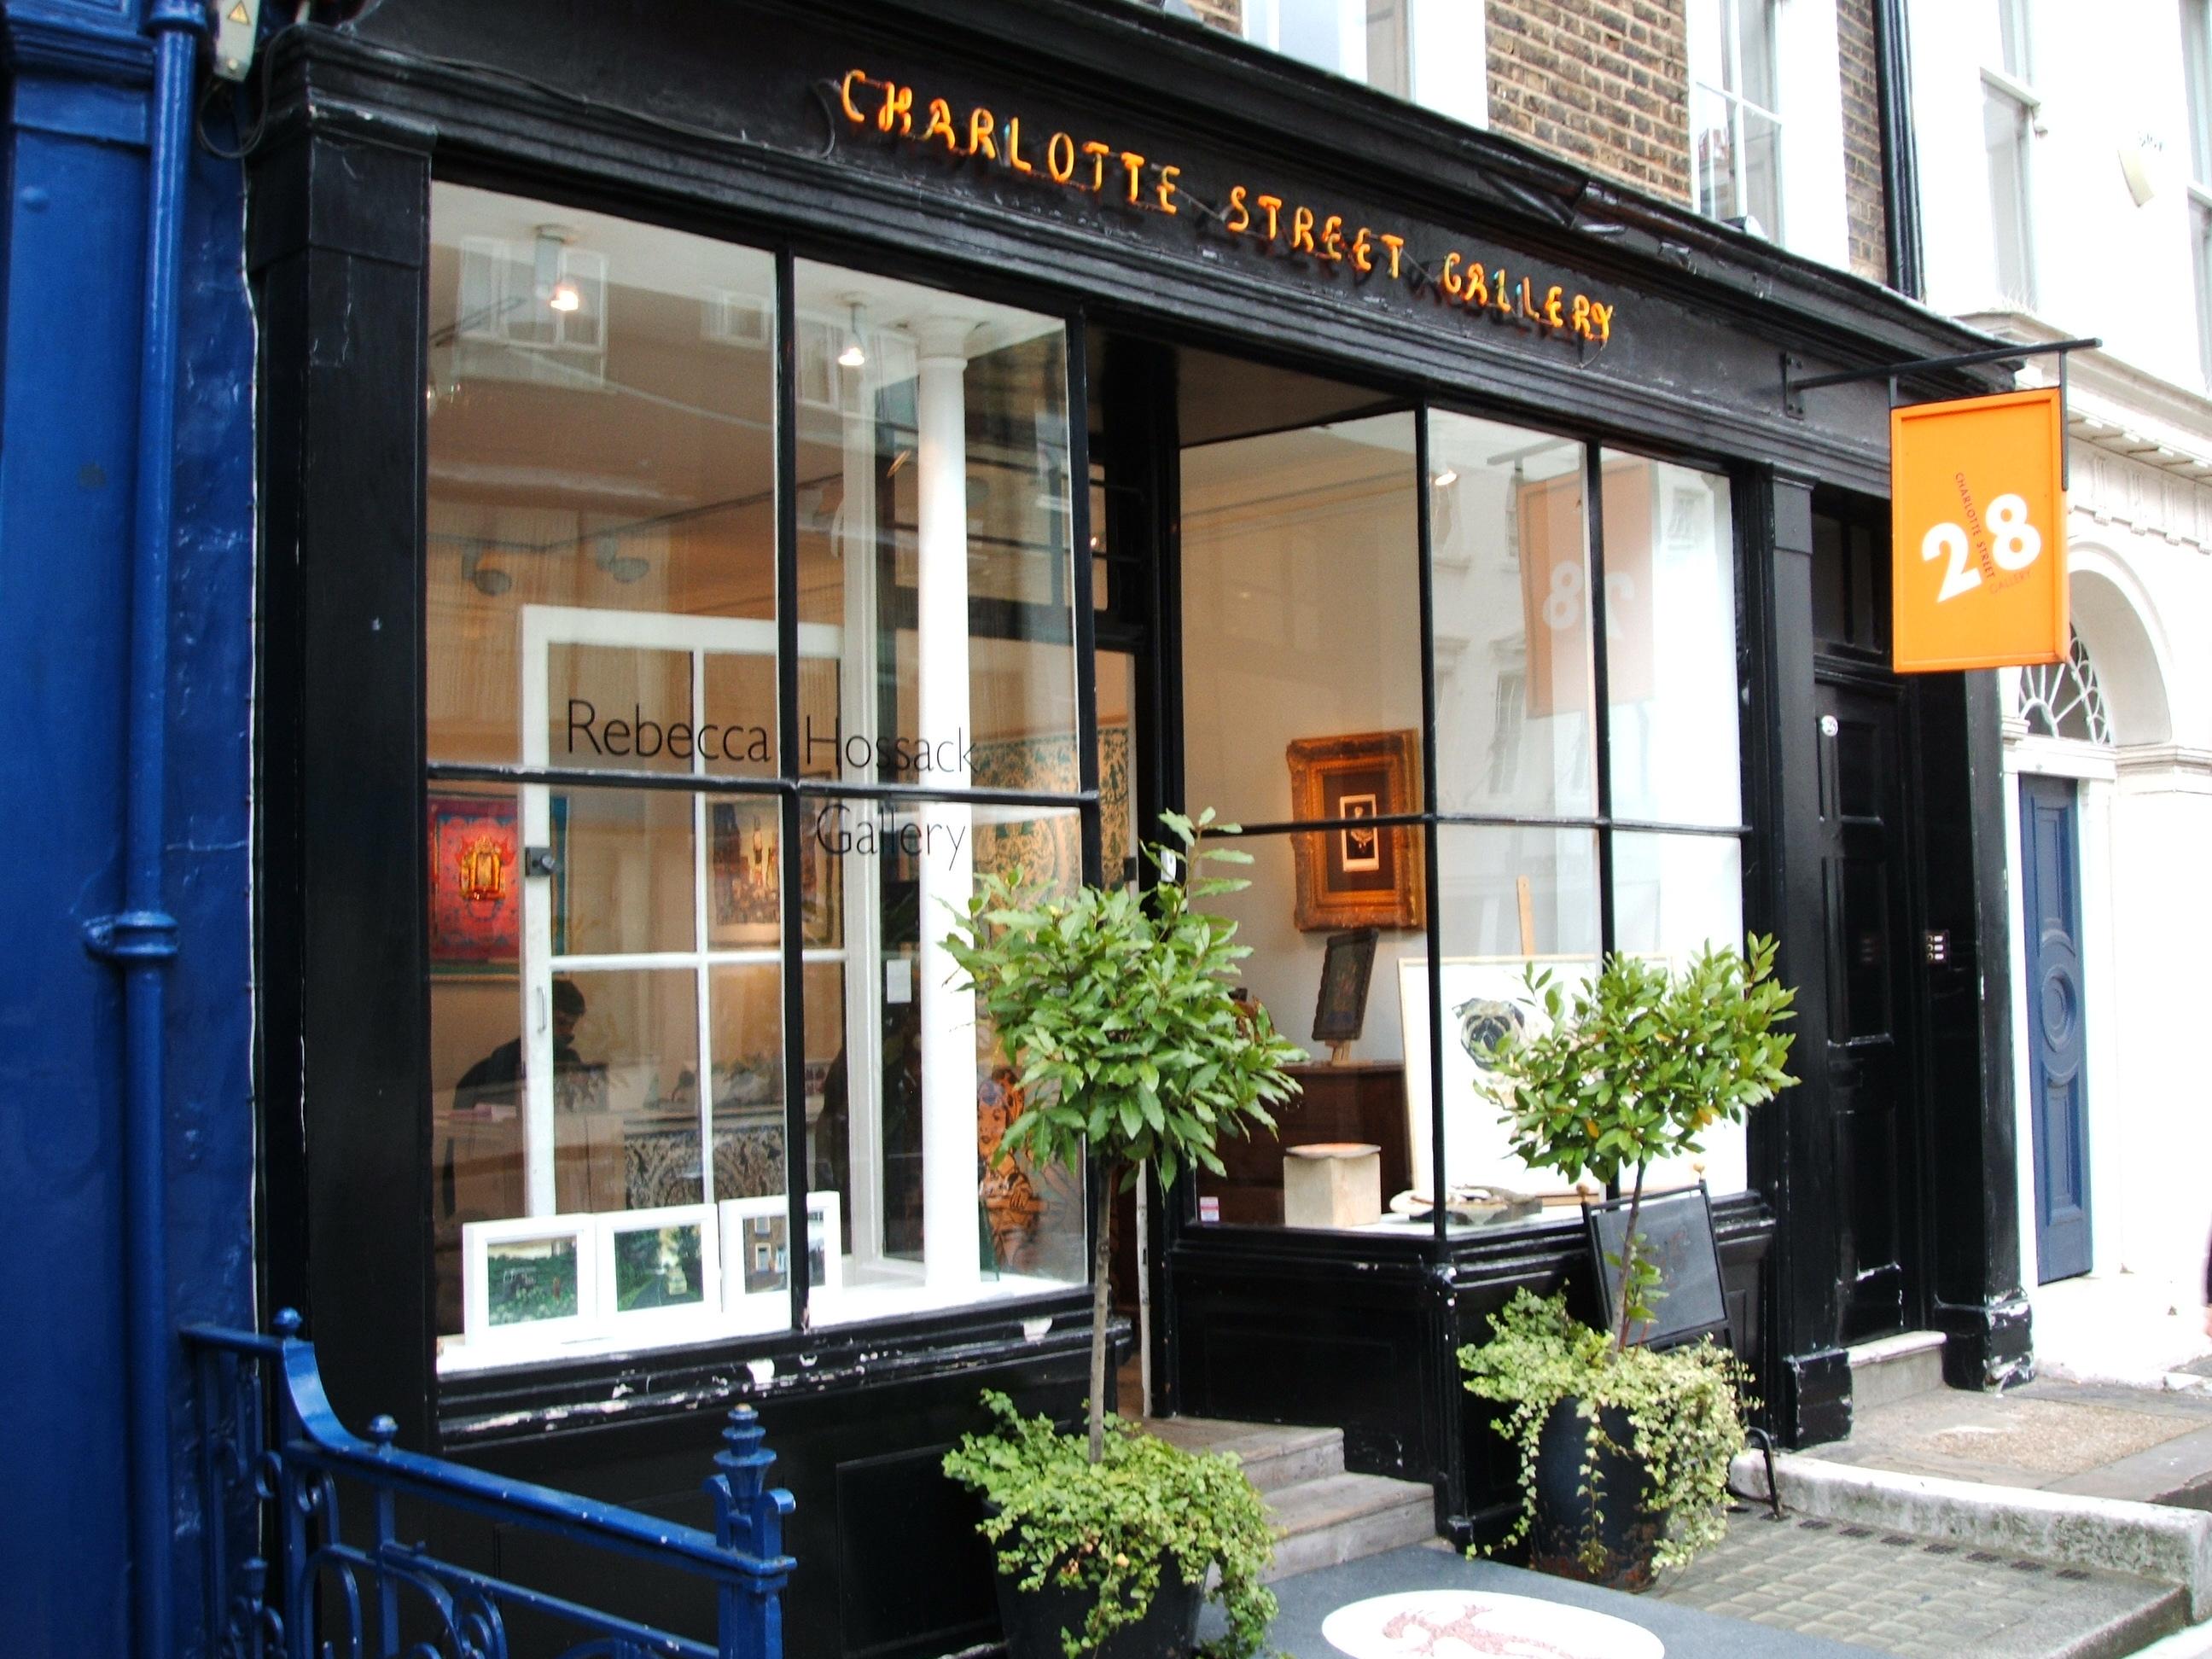 Charlotte Street Gallery London